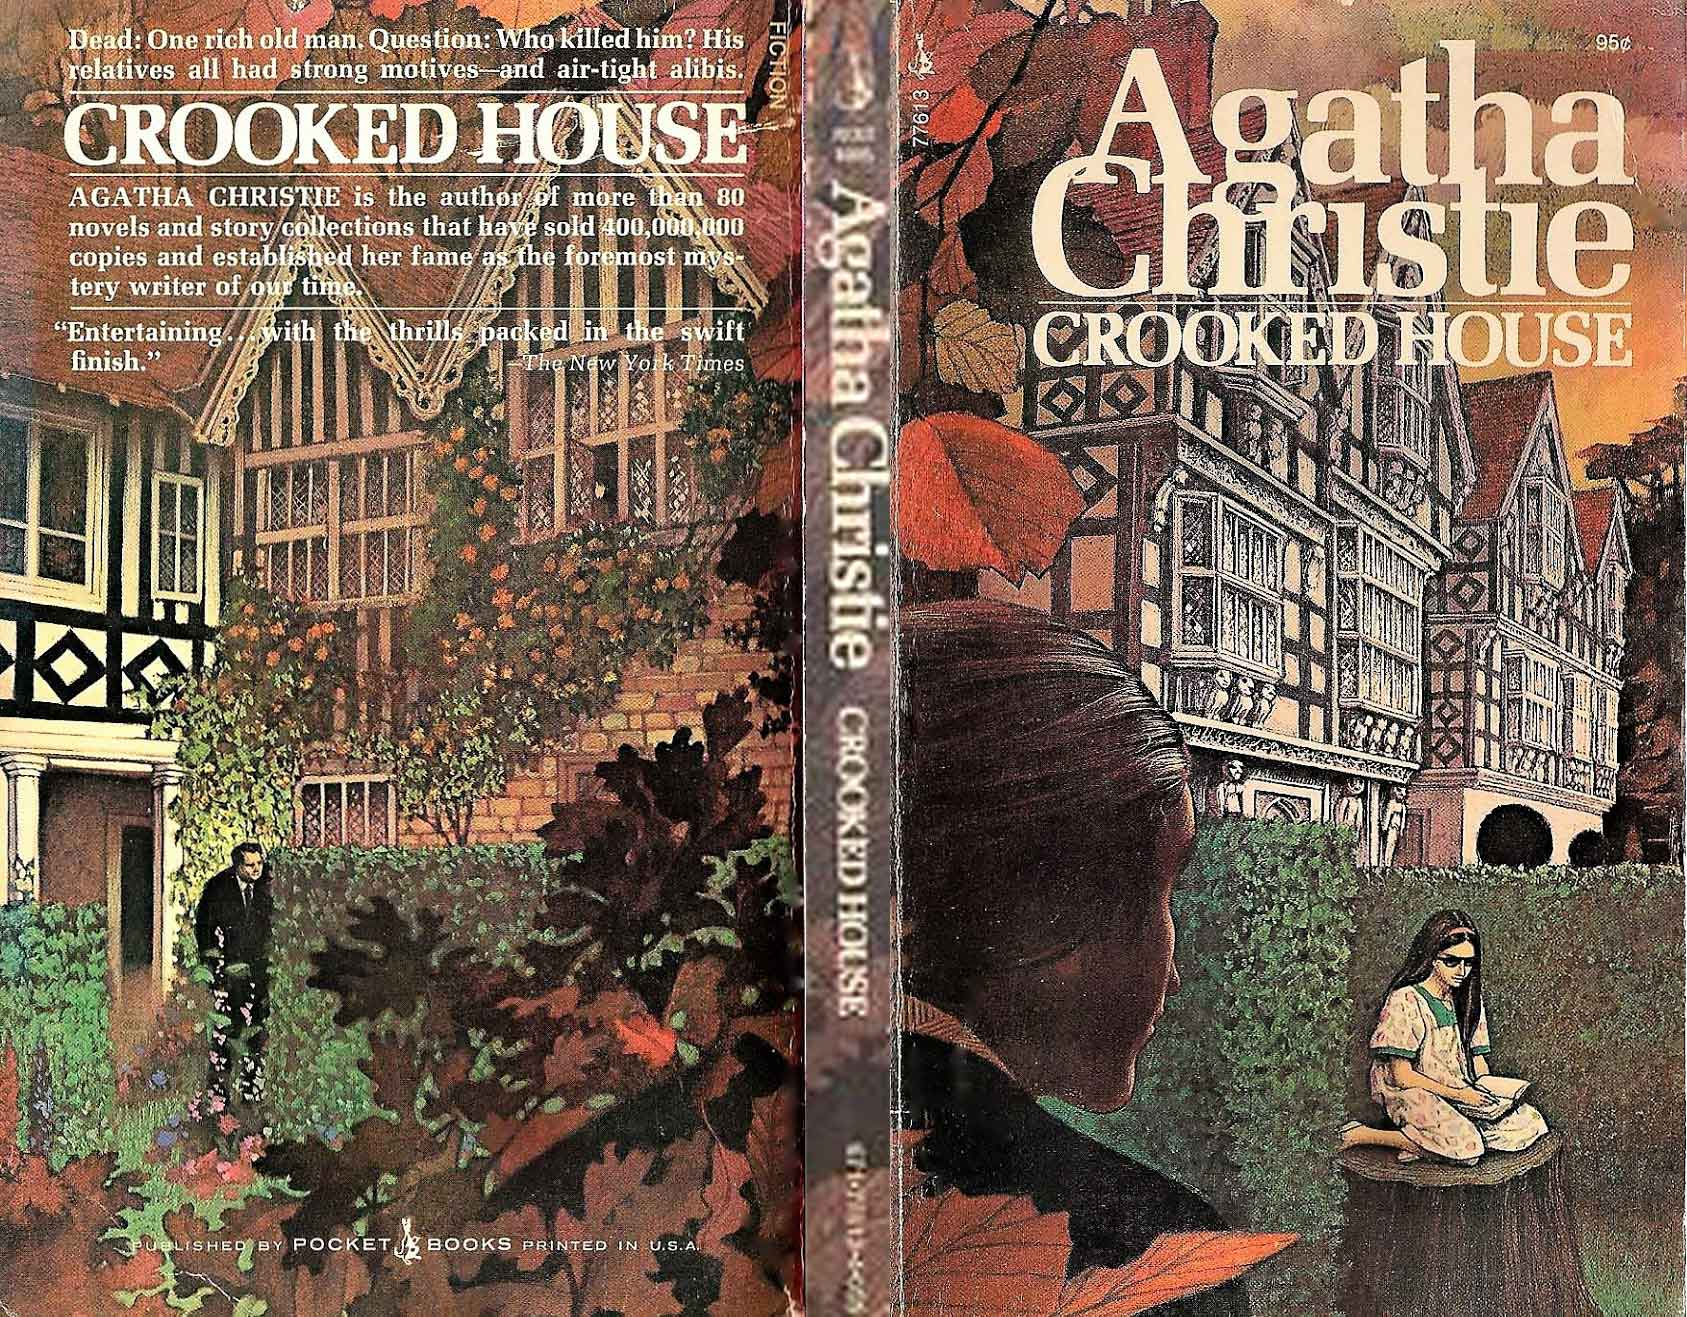 Agatha Christie Tom Adams Crooked House Pocket Books sm